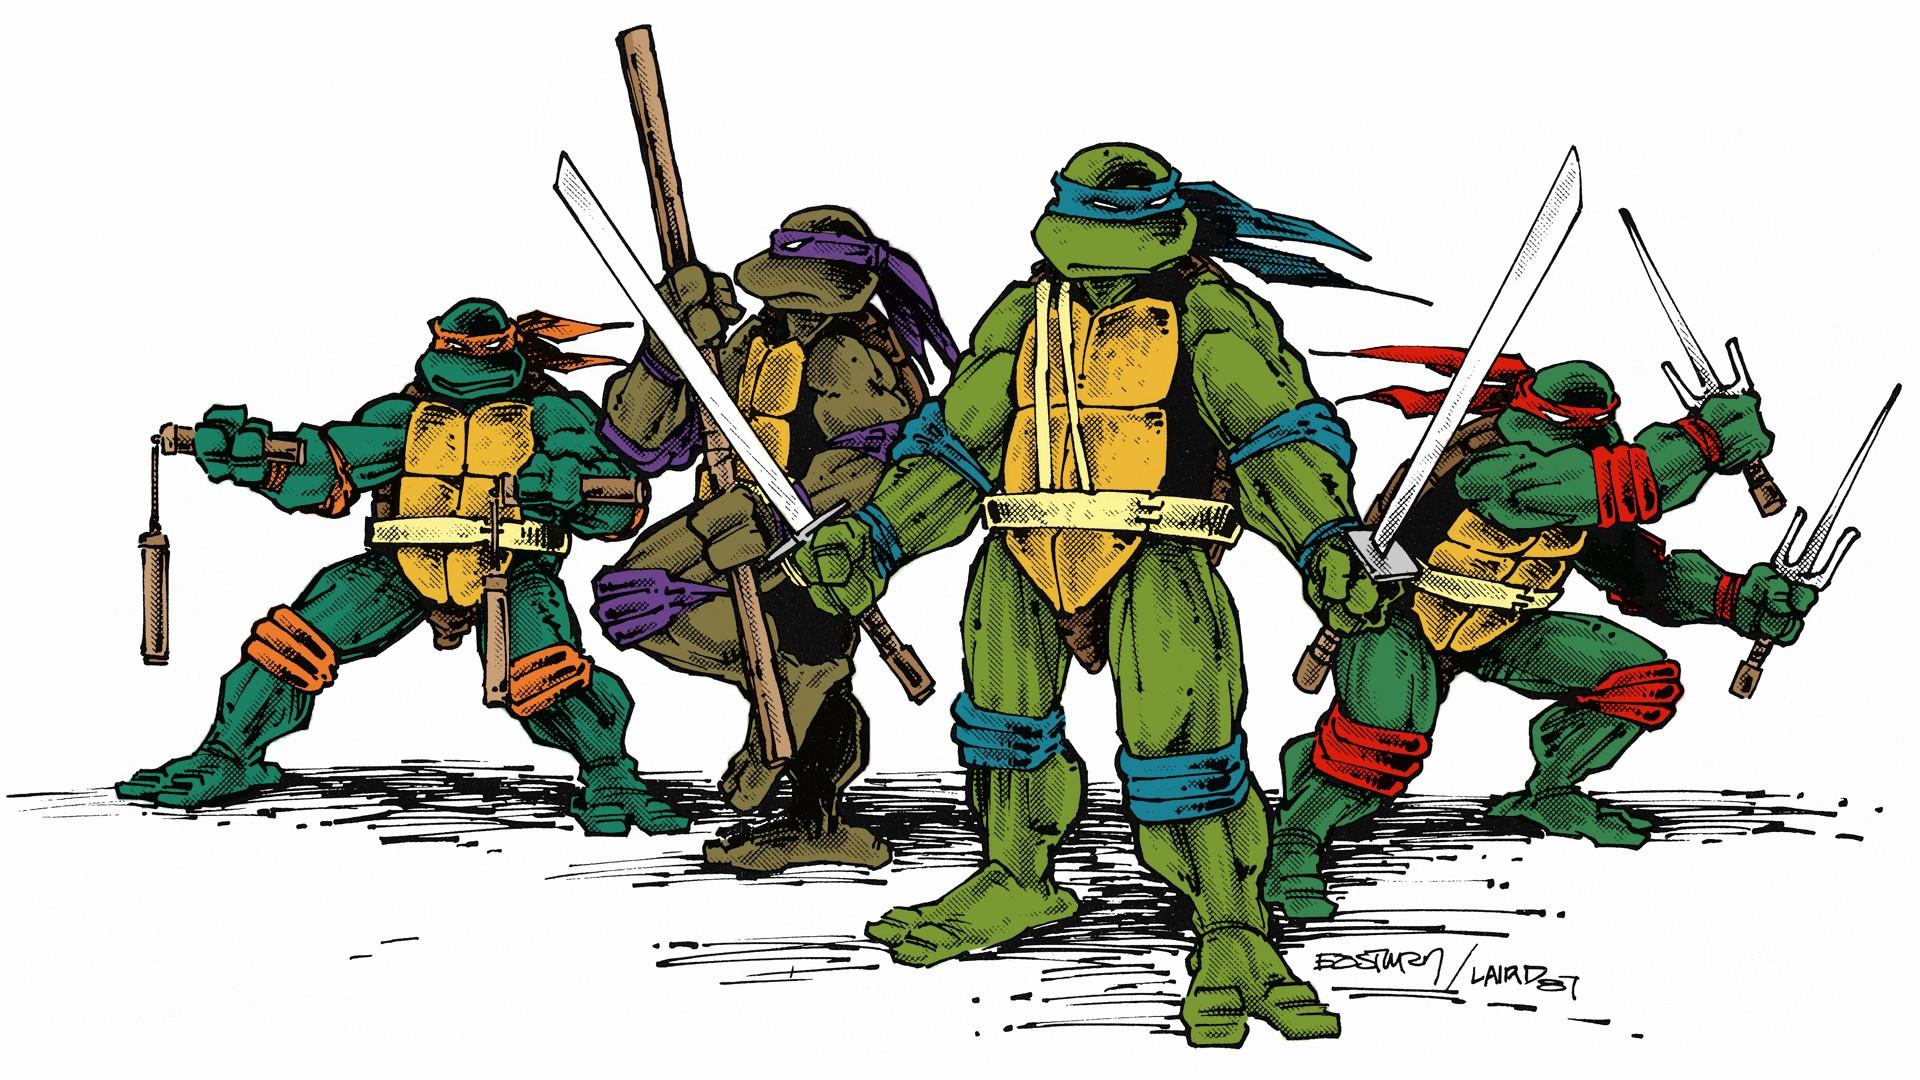 Fall Desktop Wallpaper Backgrounds Desktop Ninja Turtles Hd Wallpapers Pixelstalk Net